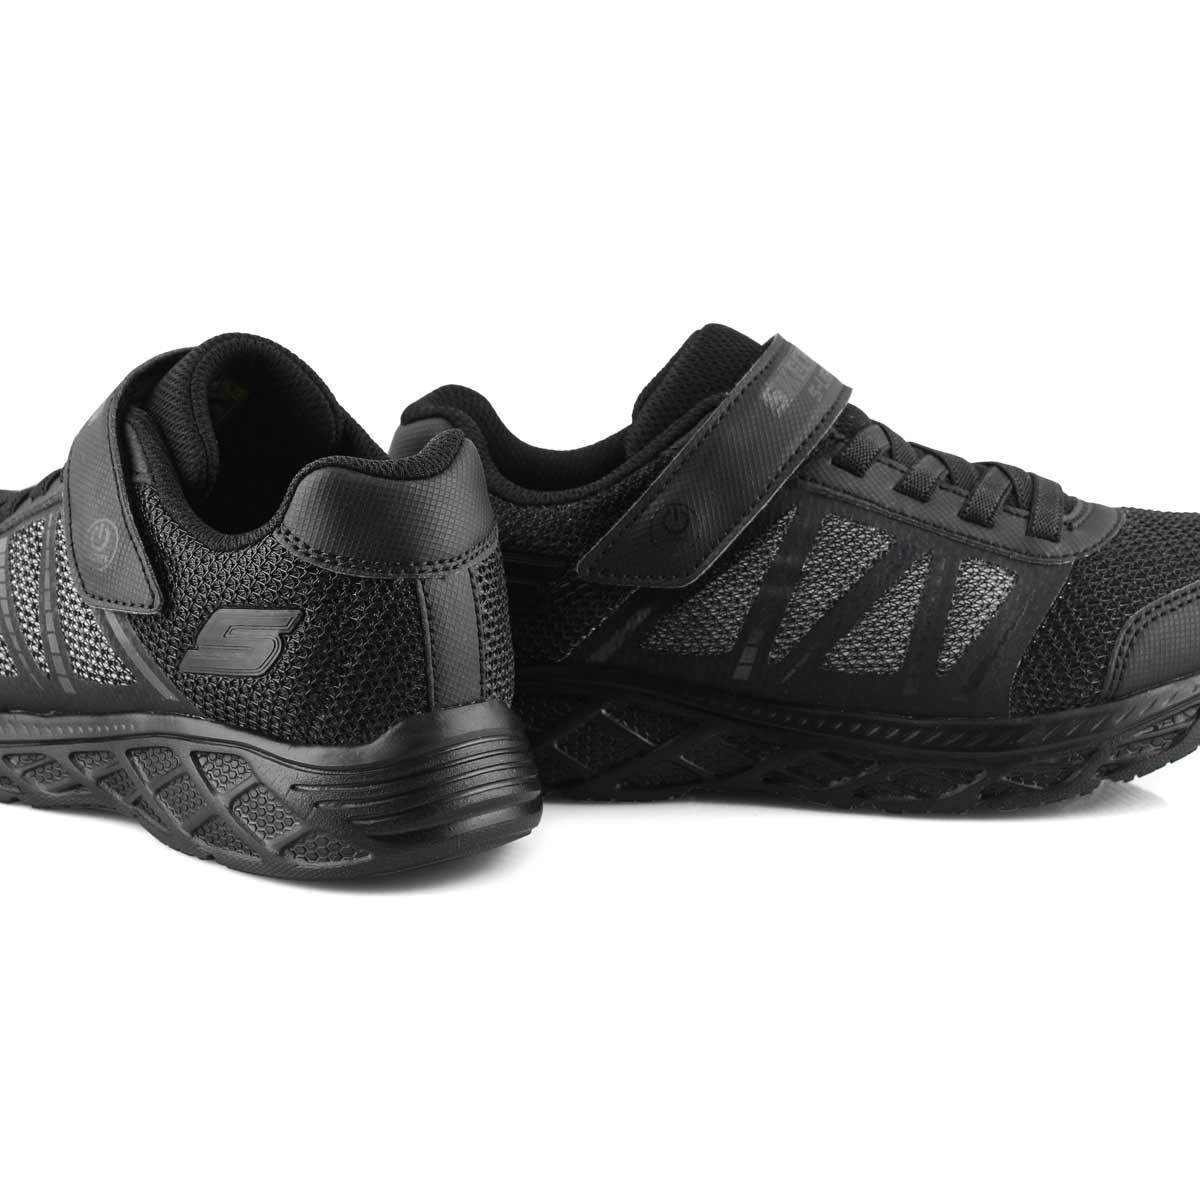 Boys' Dynamic-Flash Sneakers - Black